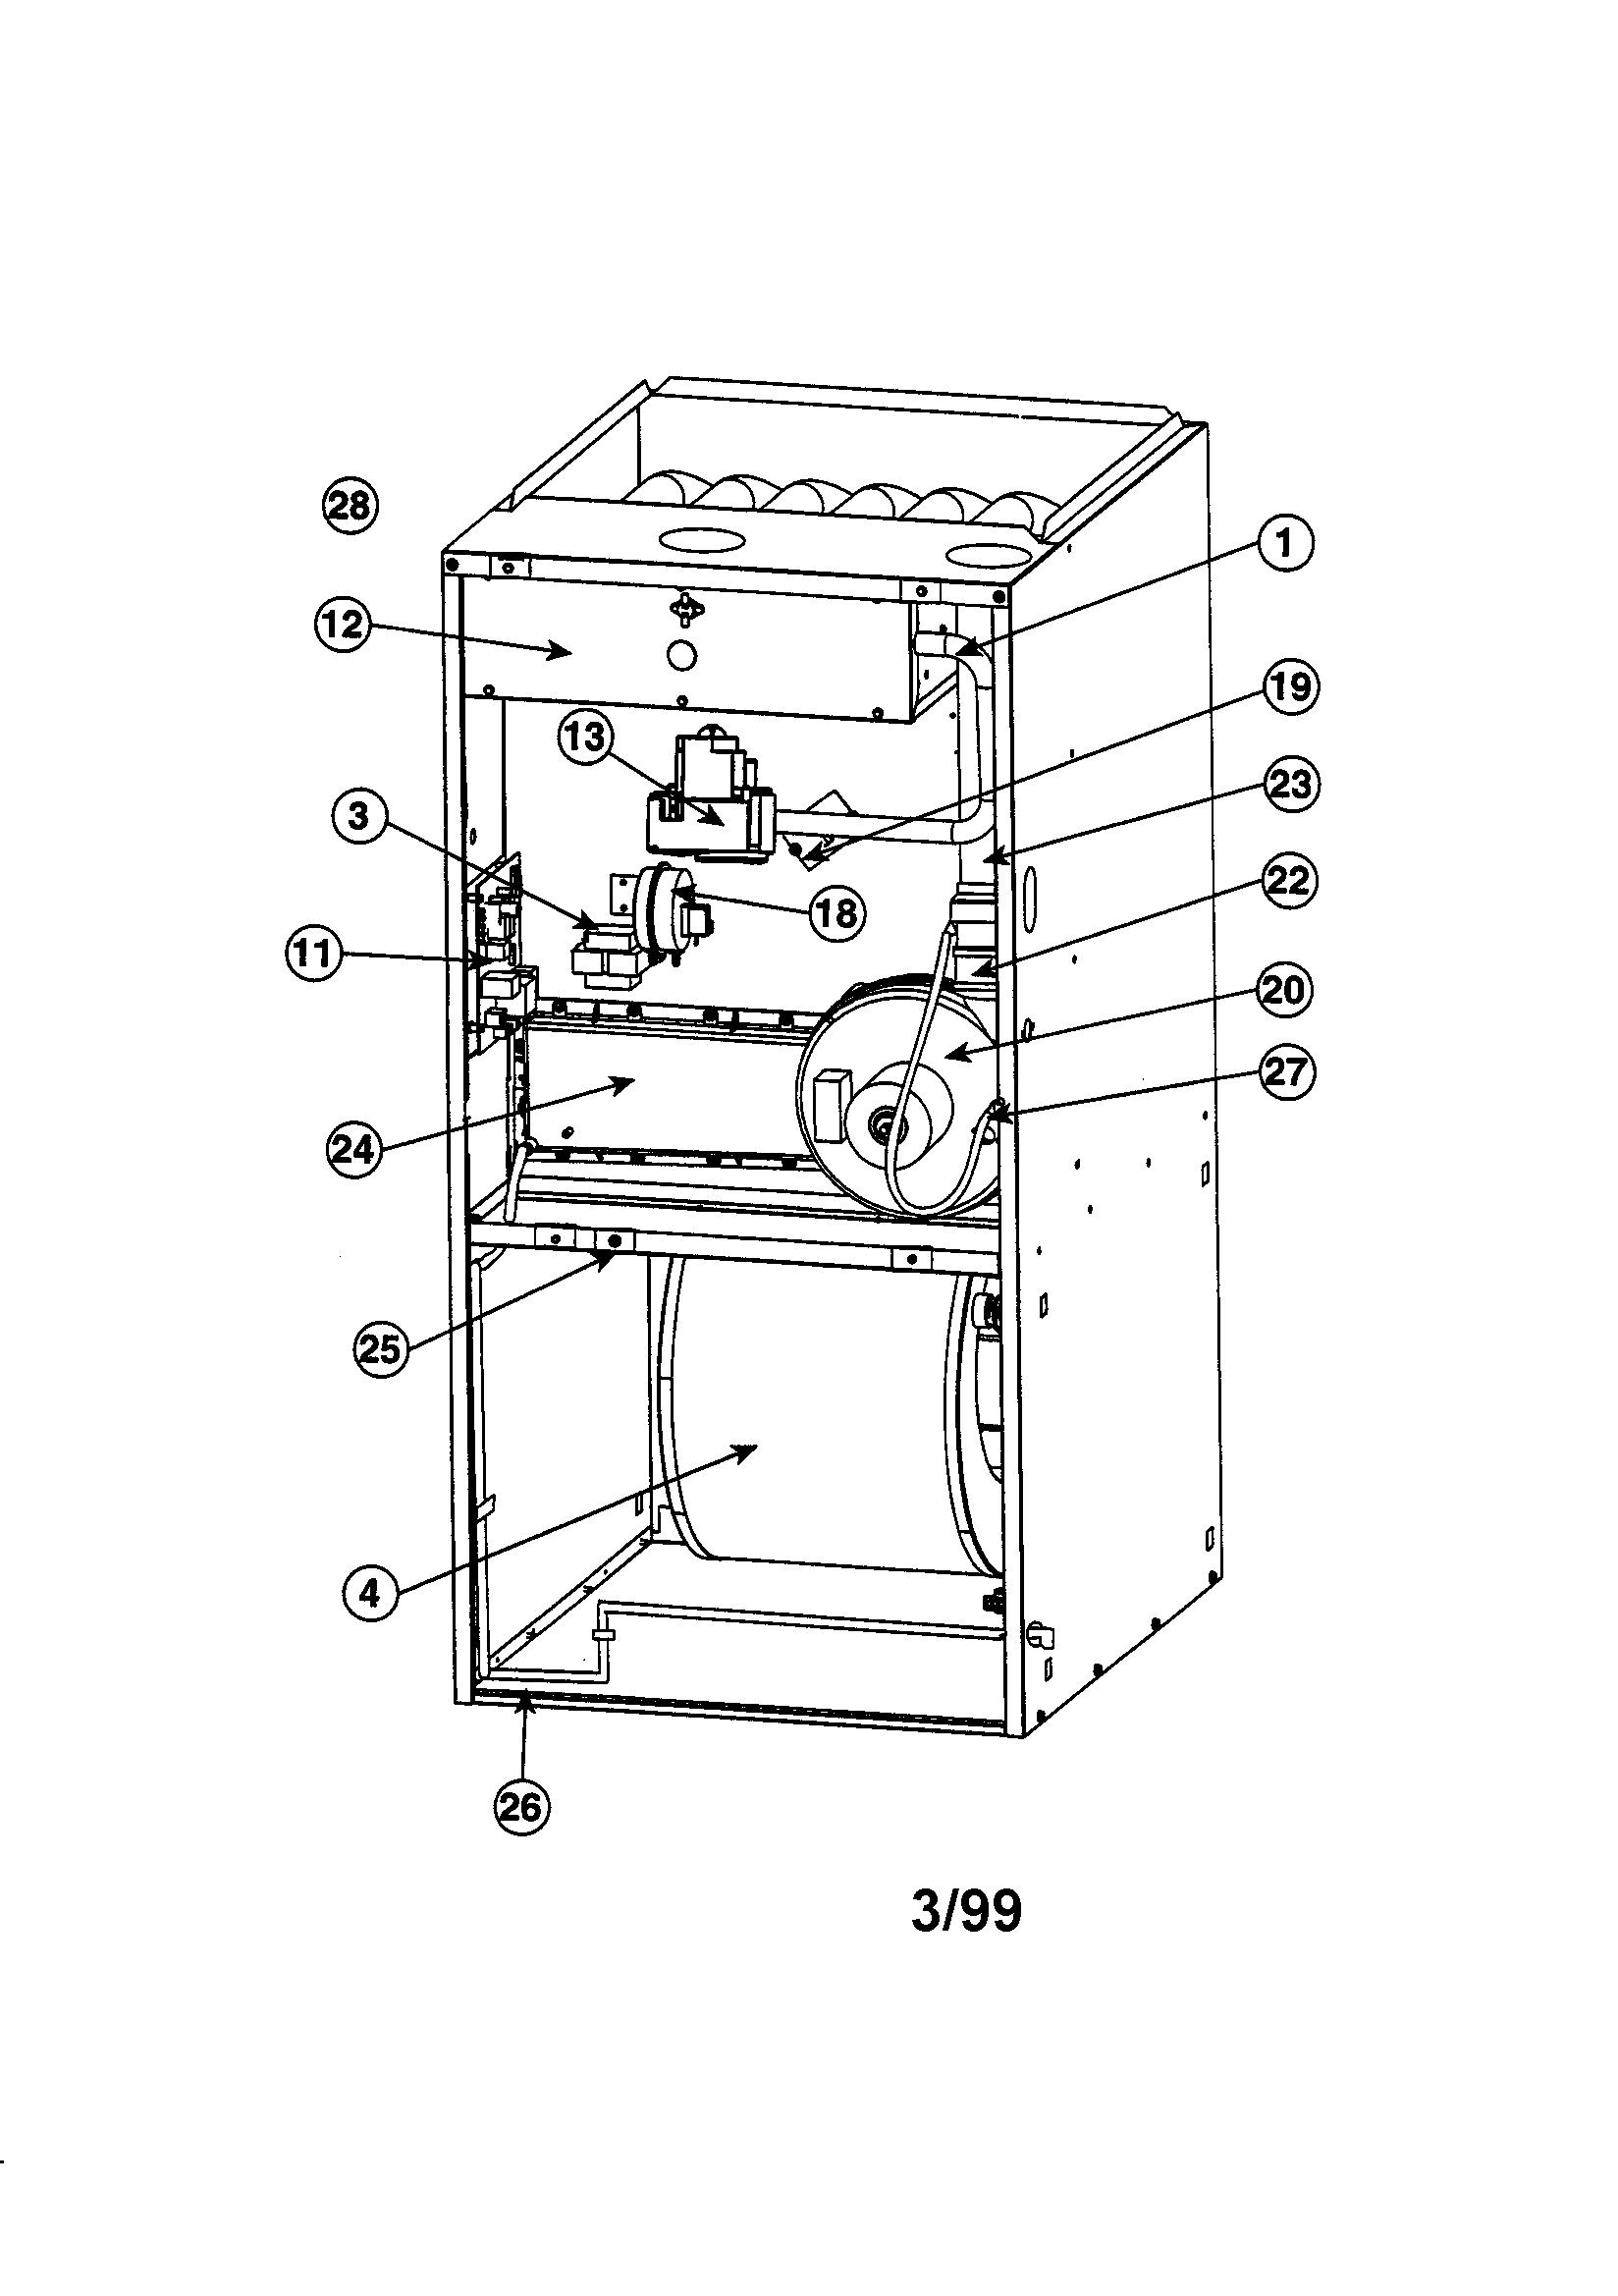 Thermal-Zone model GU080M16B furnace/heater, gas genuine parts